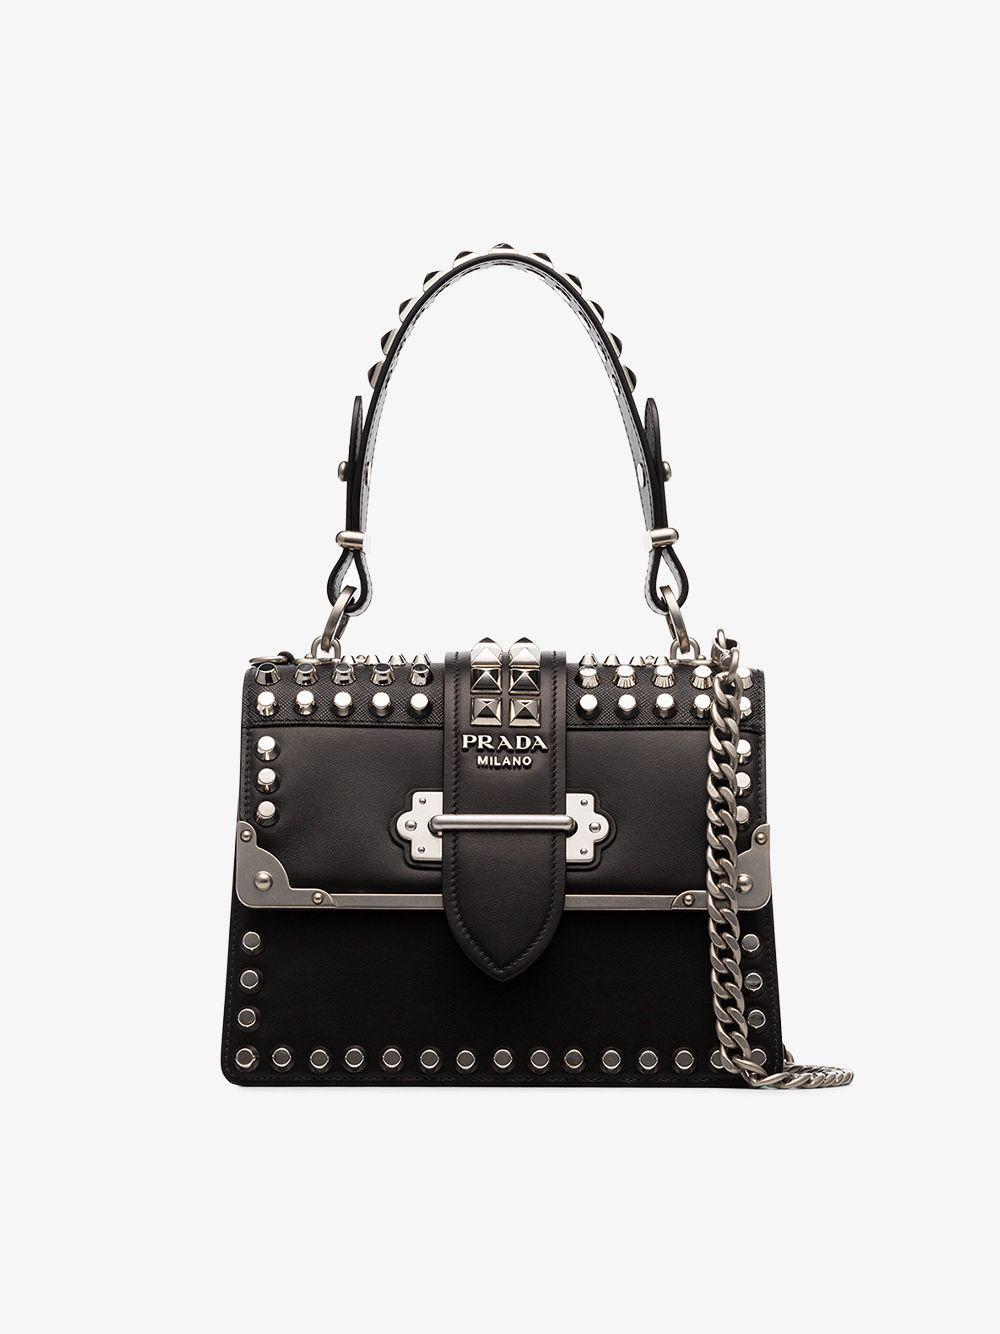 bd0fbdc0d3be Prada - Black Cahier Studded Tote Bag - Lyst. View fullscreen